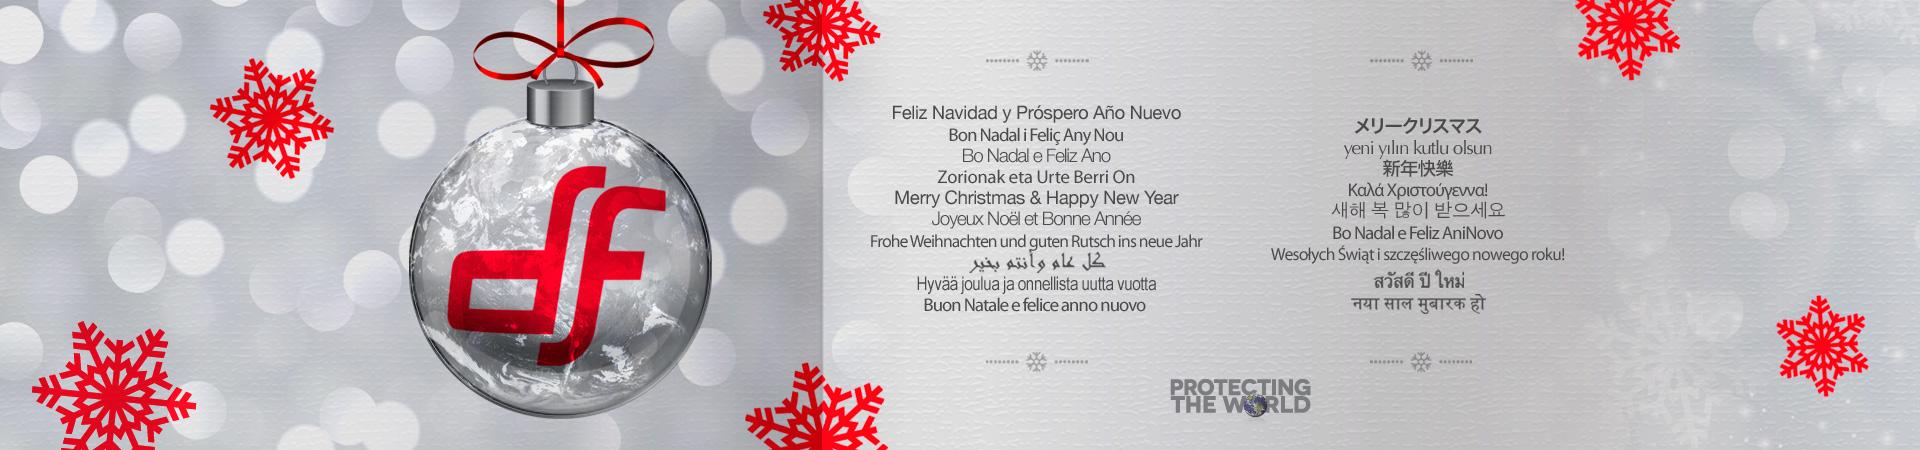 slide-home-merry-christmas-20141